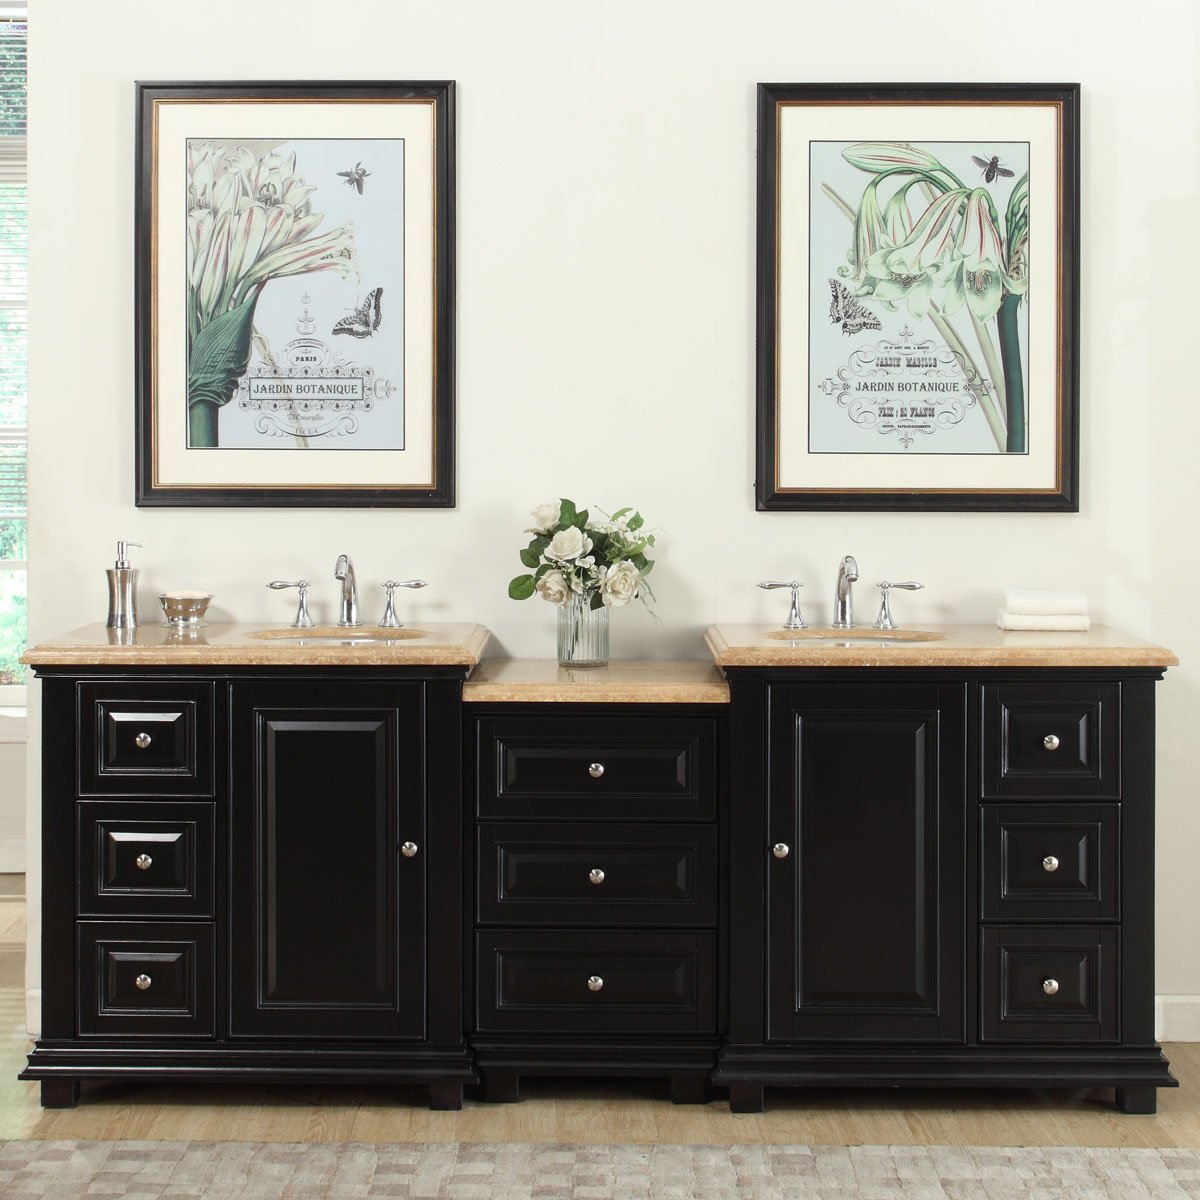 Silkroad Exclusive Bathroom Vanity Travertine Top Double Sink Cabinet, 90.5''